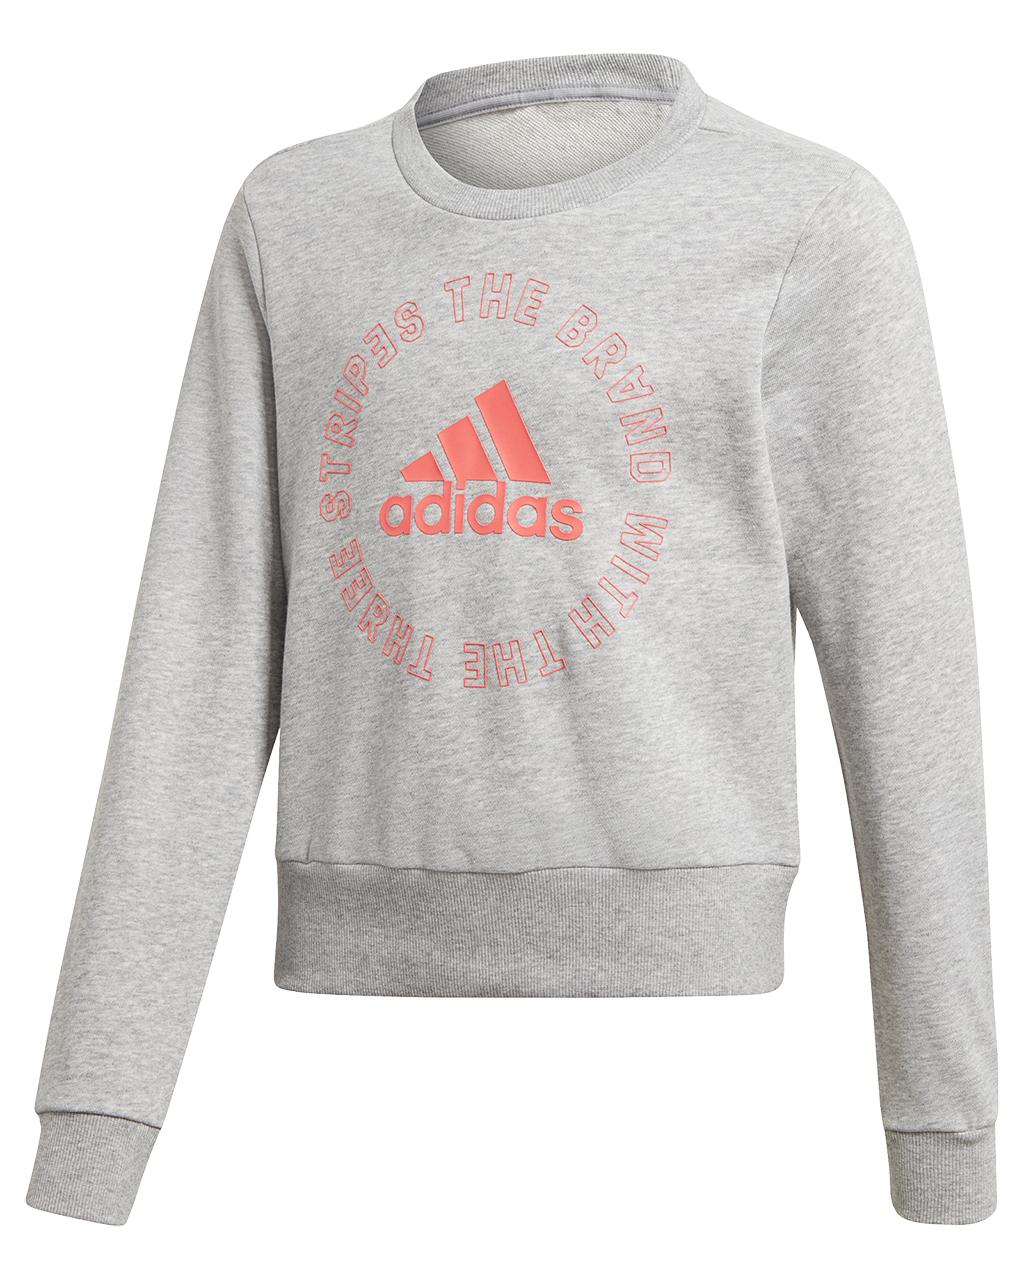 Bold Crew Sweatshirt JR MGreyHSigpnk